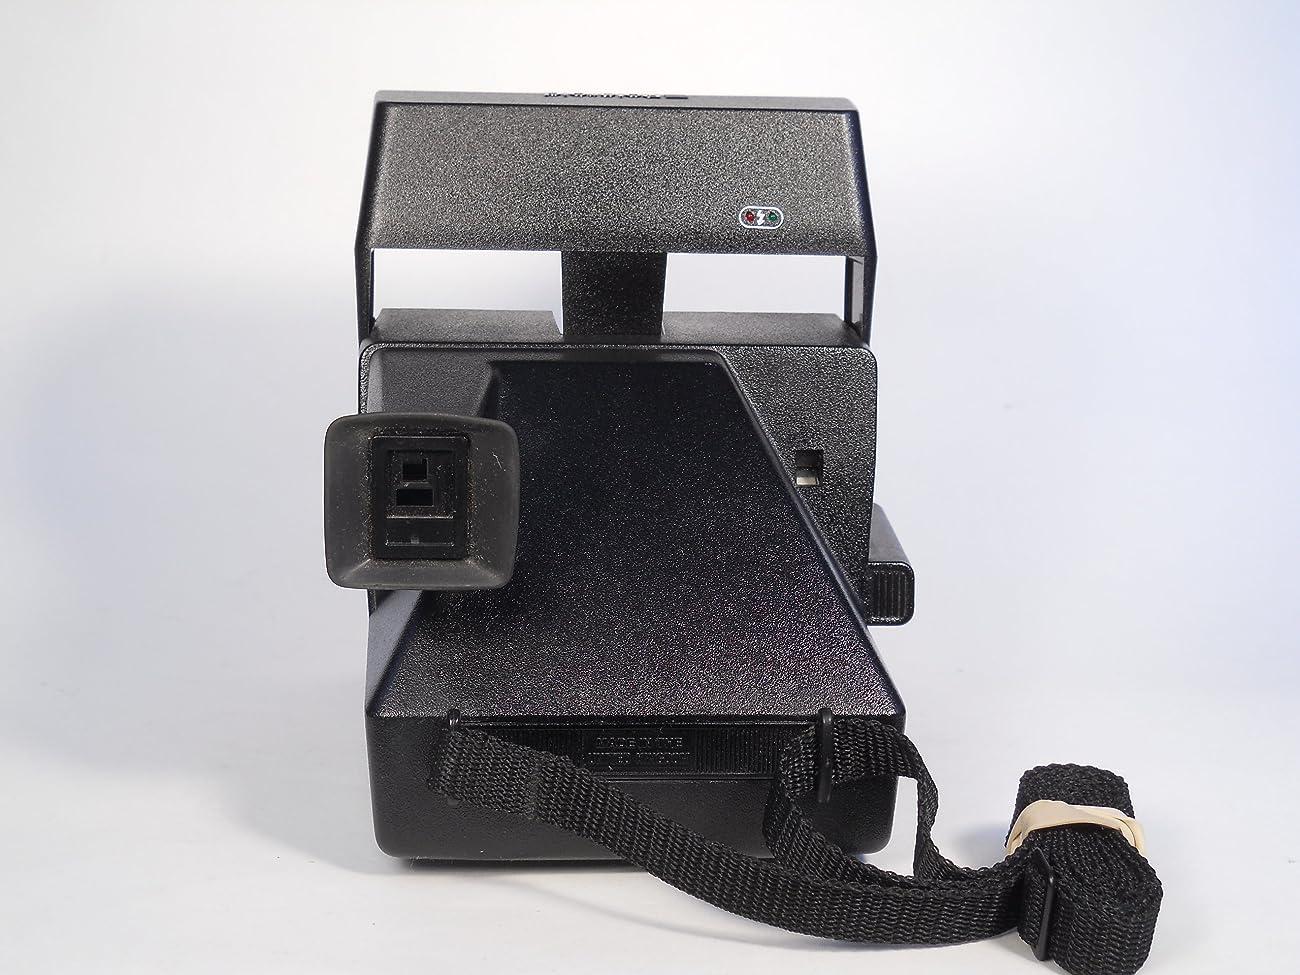 Polaroid Spirit 600 Vintage Instant Camera w/ Silver/Gray Front 5